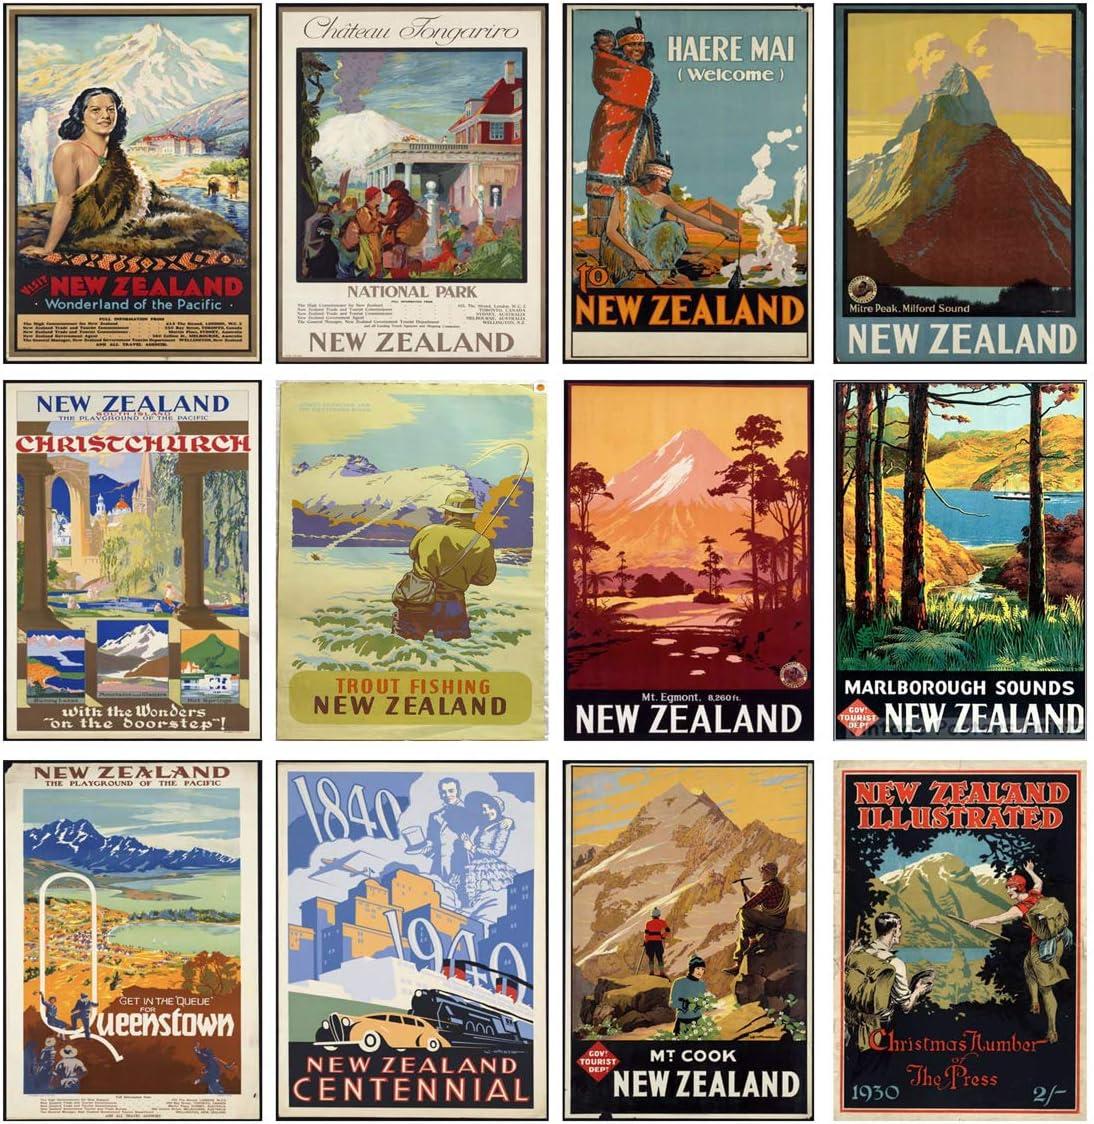 New Zealand Vintage Posters 2020 Calendar